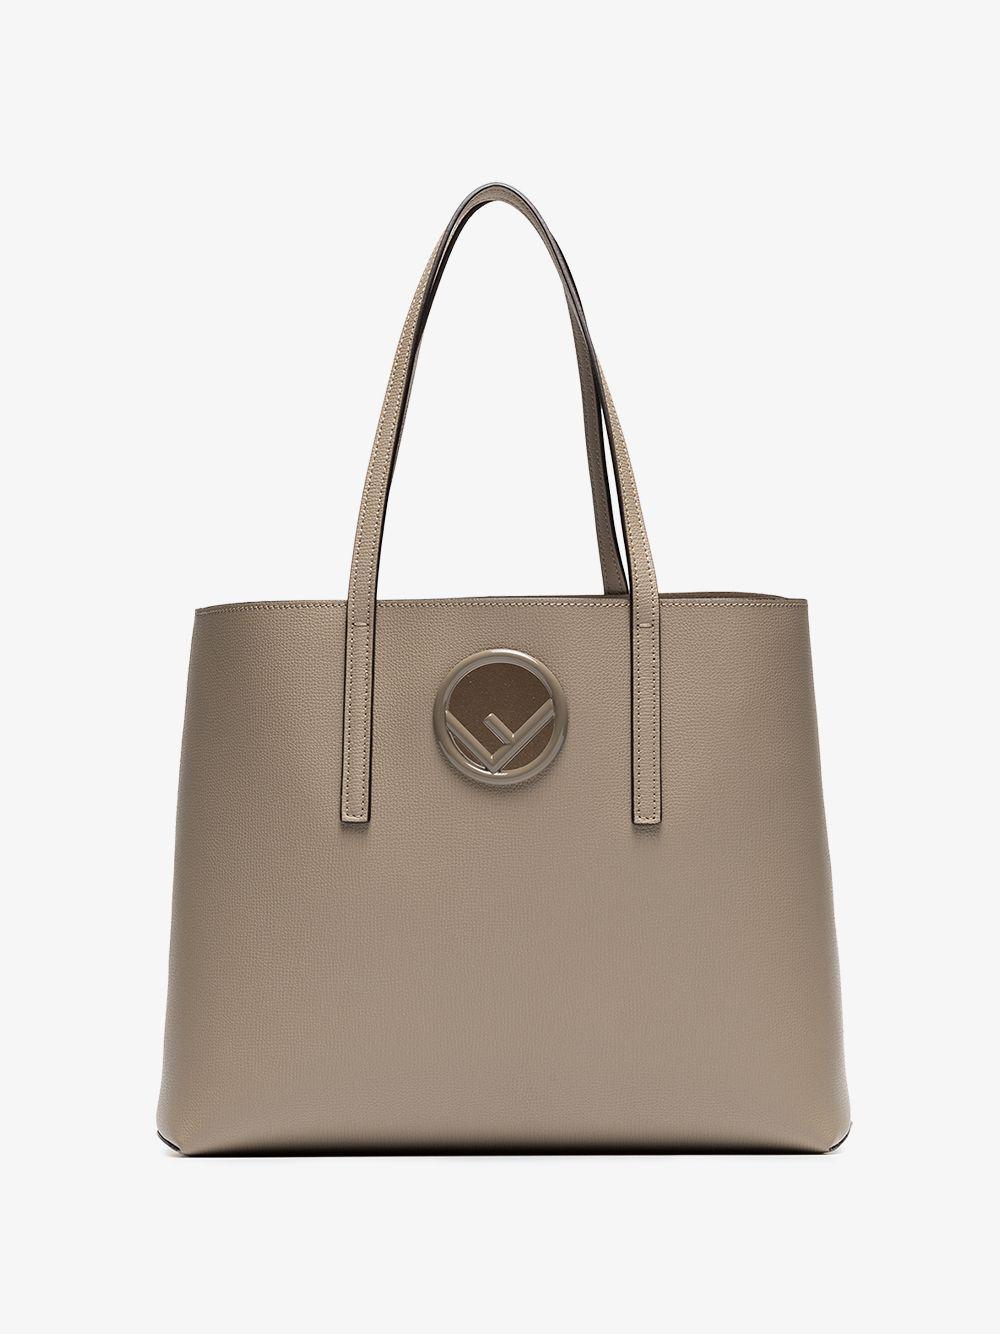 Fendi - Natural Beige Logo Plaque Leather Shopper Bag - Lyst. View  fullscreen a24eb8e139f7a